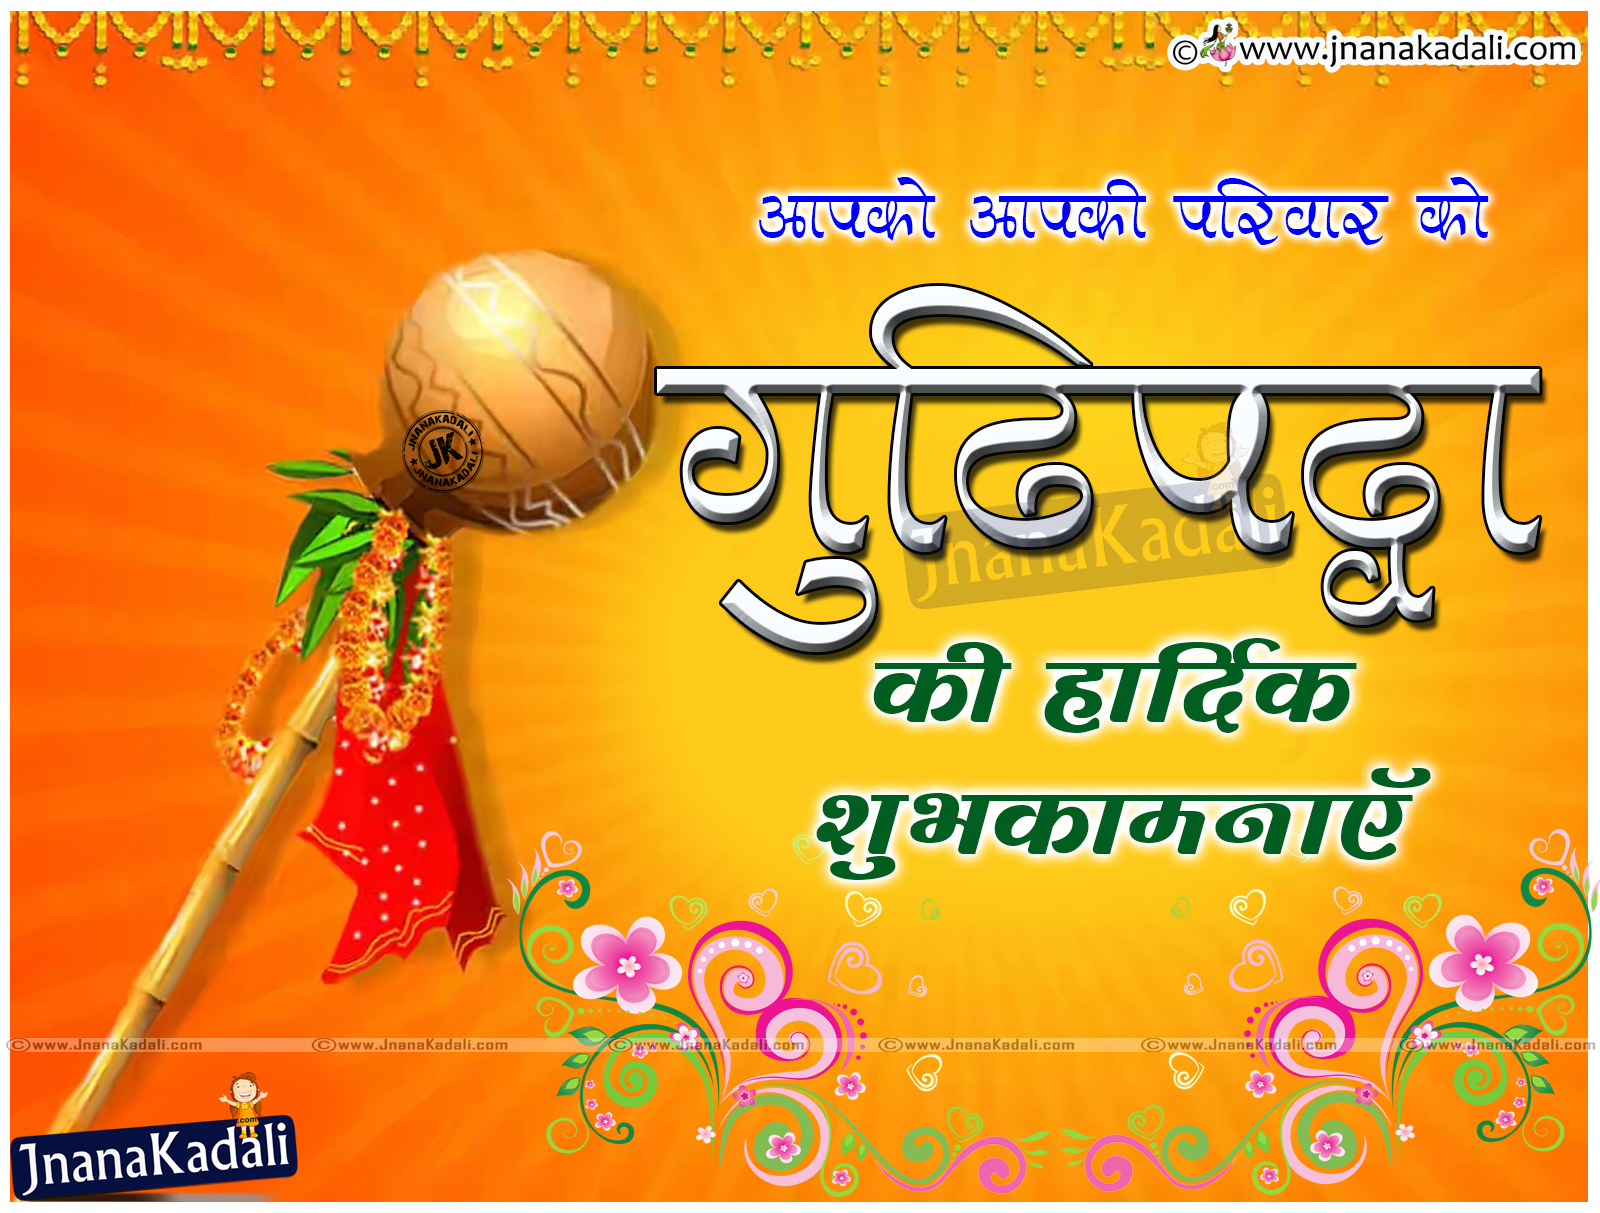 Gudi Padwa Greetings In Marathi Language Choice Image Greetings